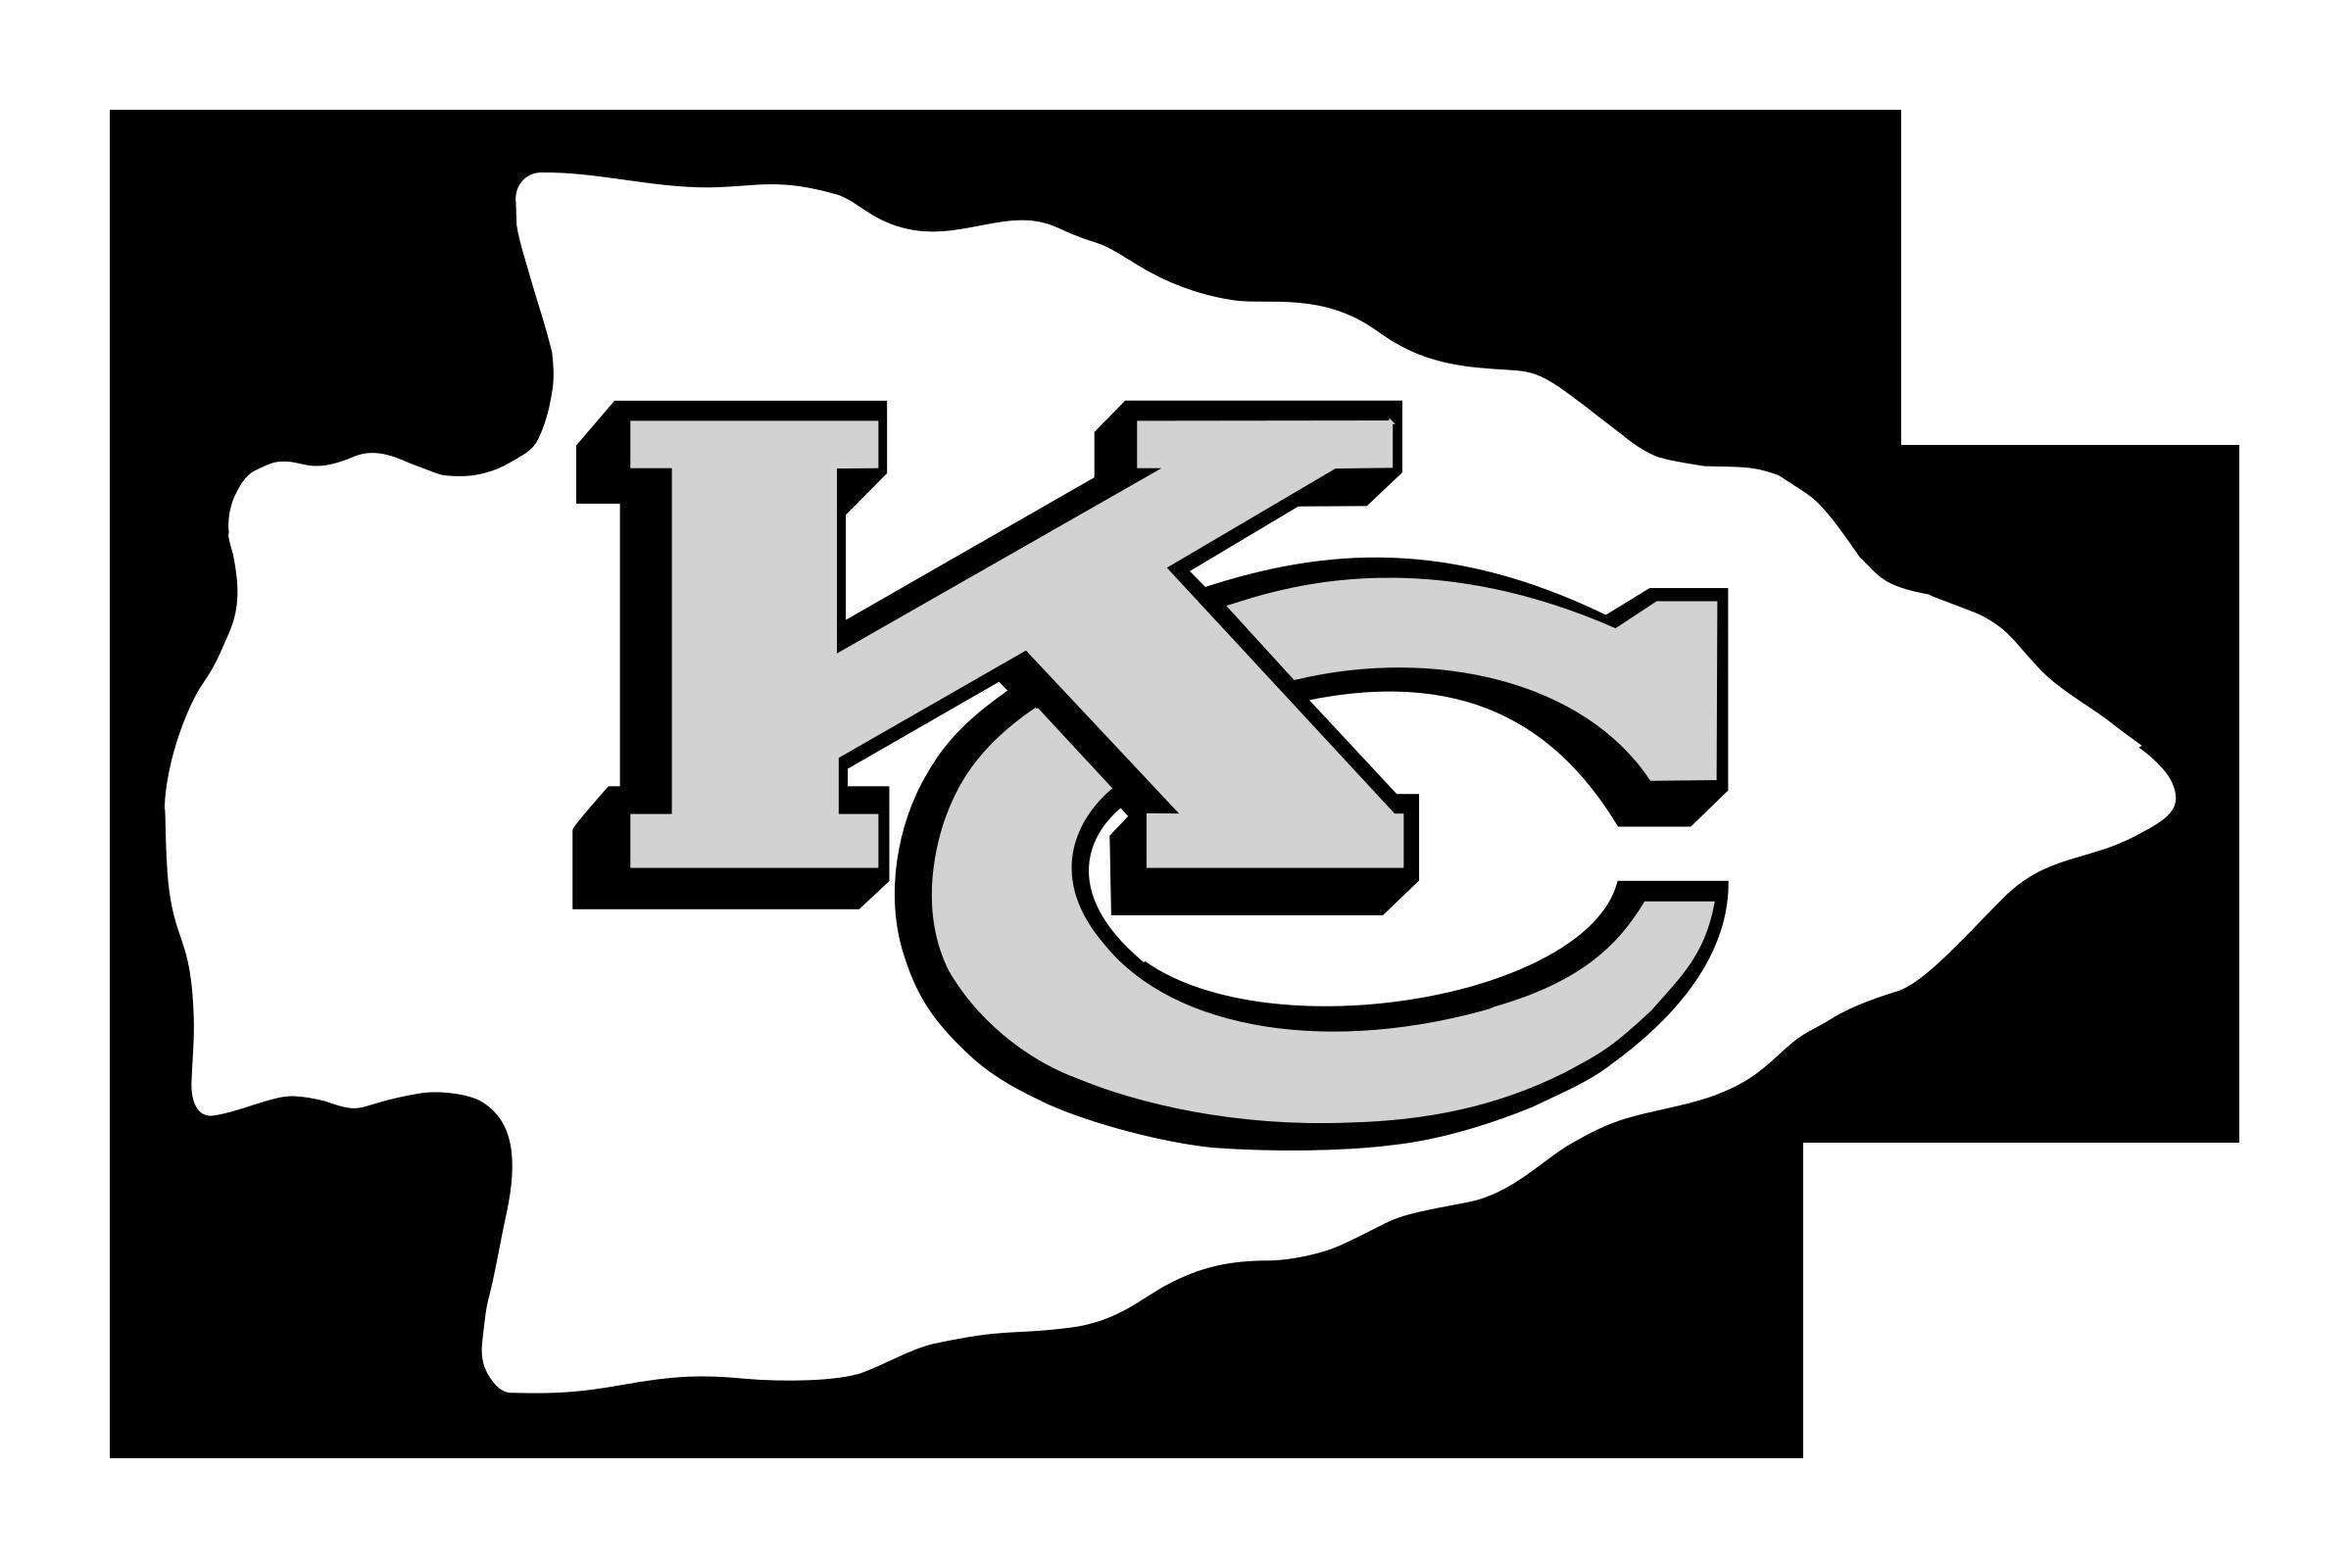 Logo png transparent svg. Helmet clipart kansas city chiefs